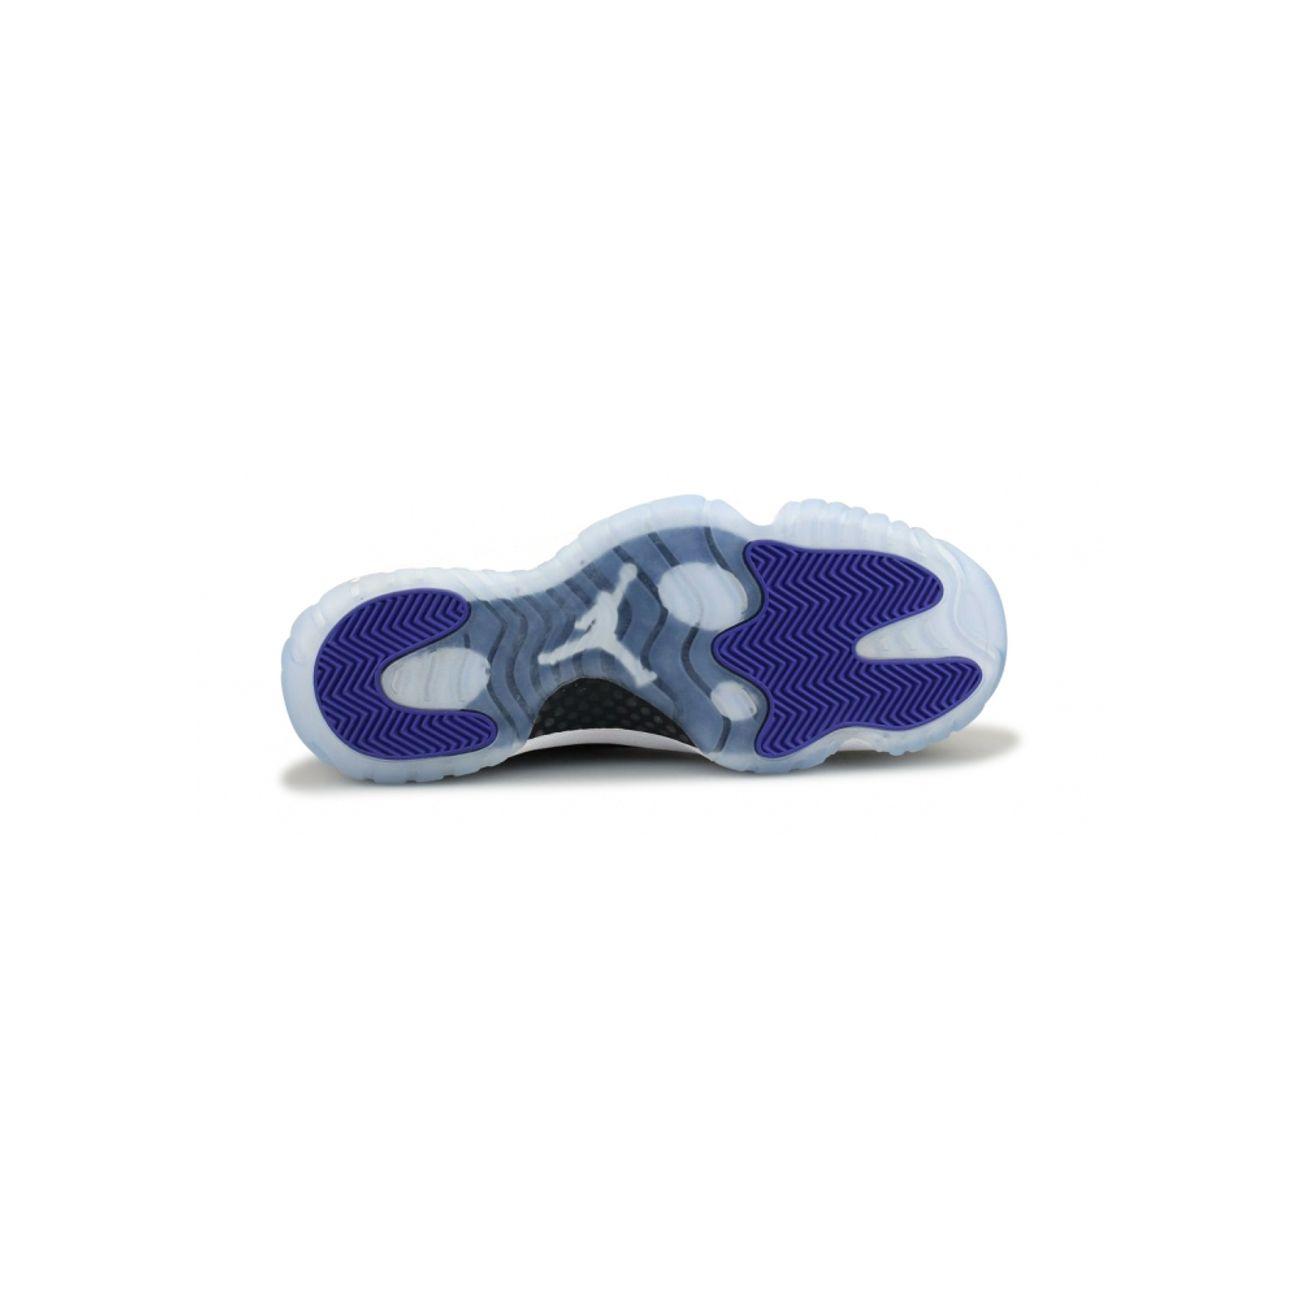 Blanc Jordan ModeLifestyle Air Xi Homme 378037 Concord Retro Nike Basket 100 6YbvfgyI7m